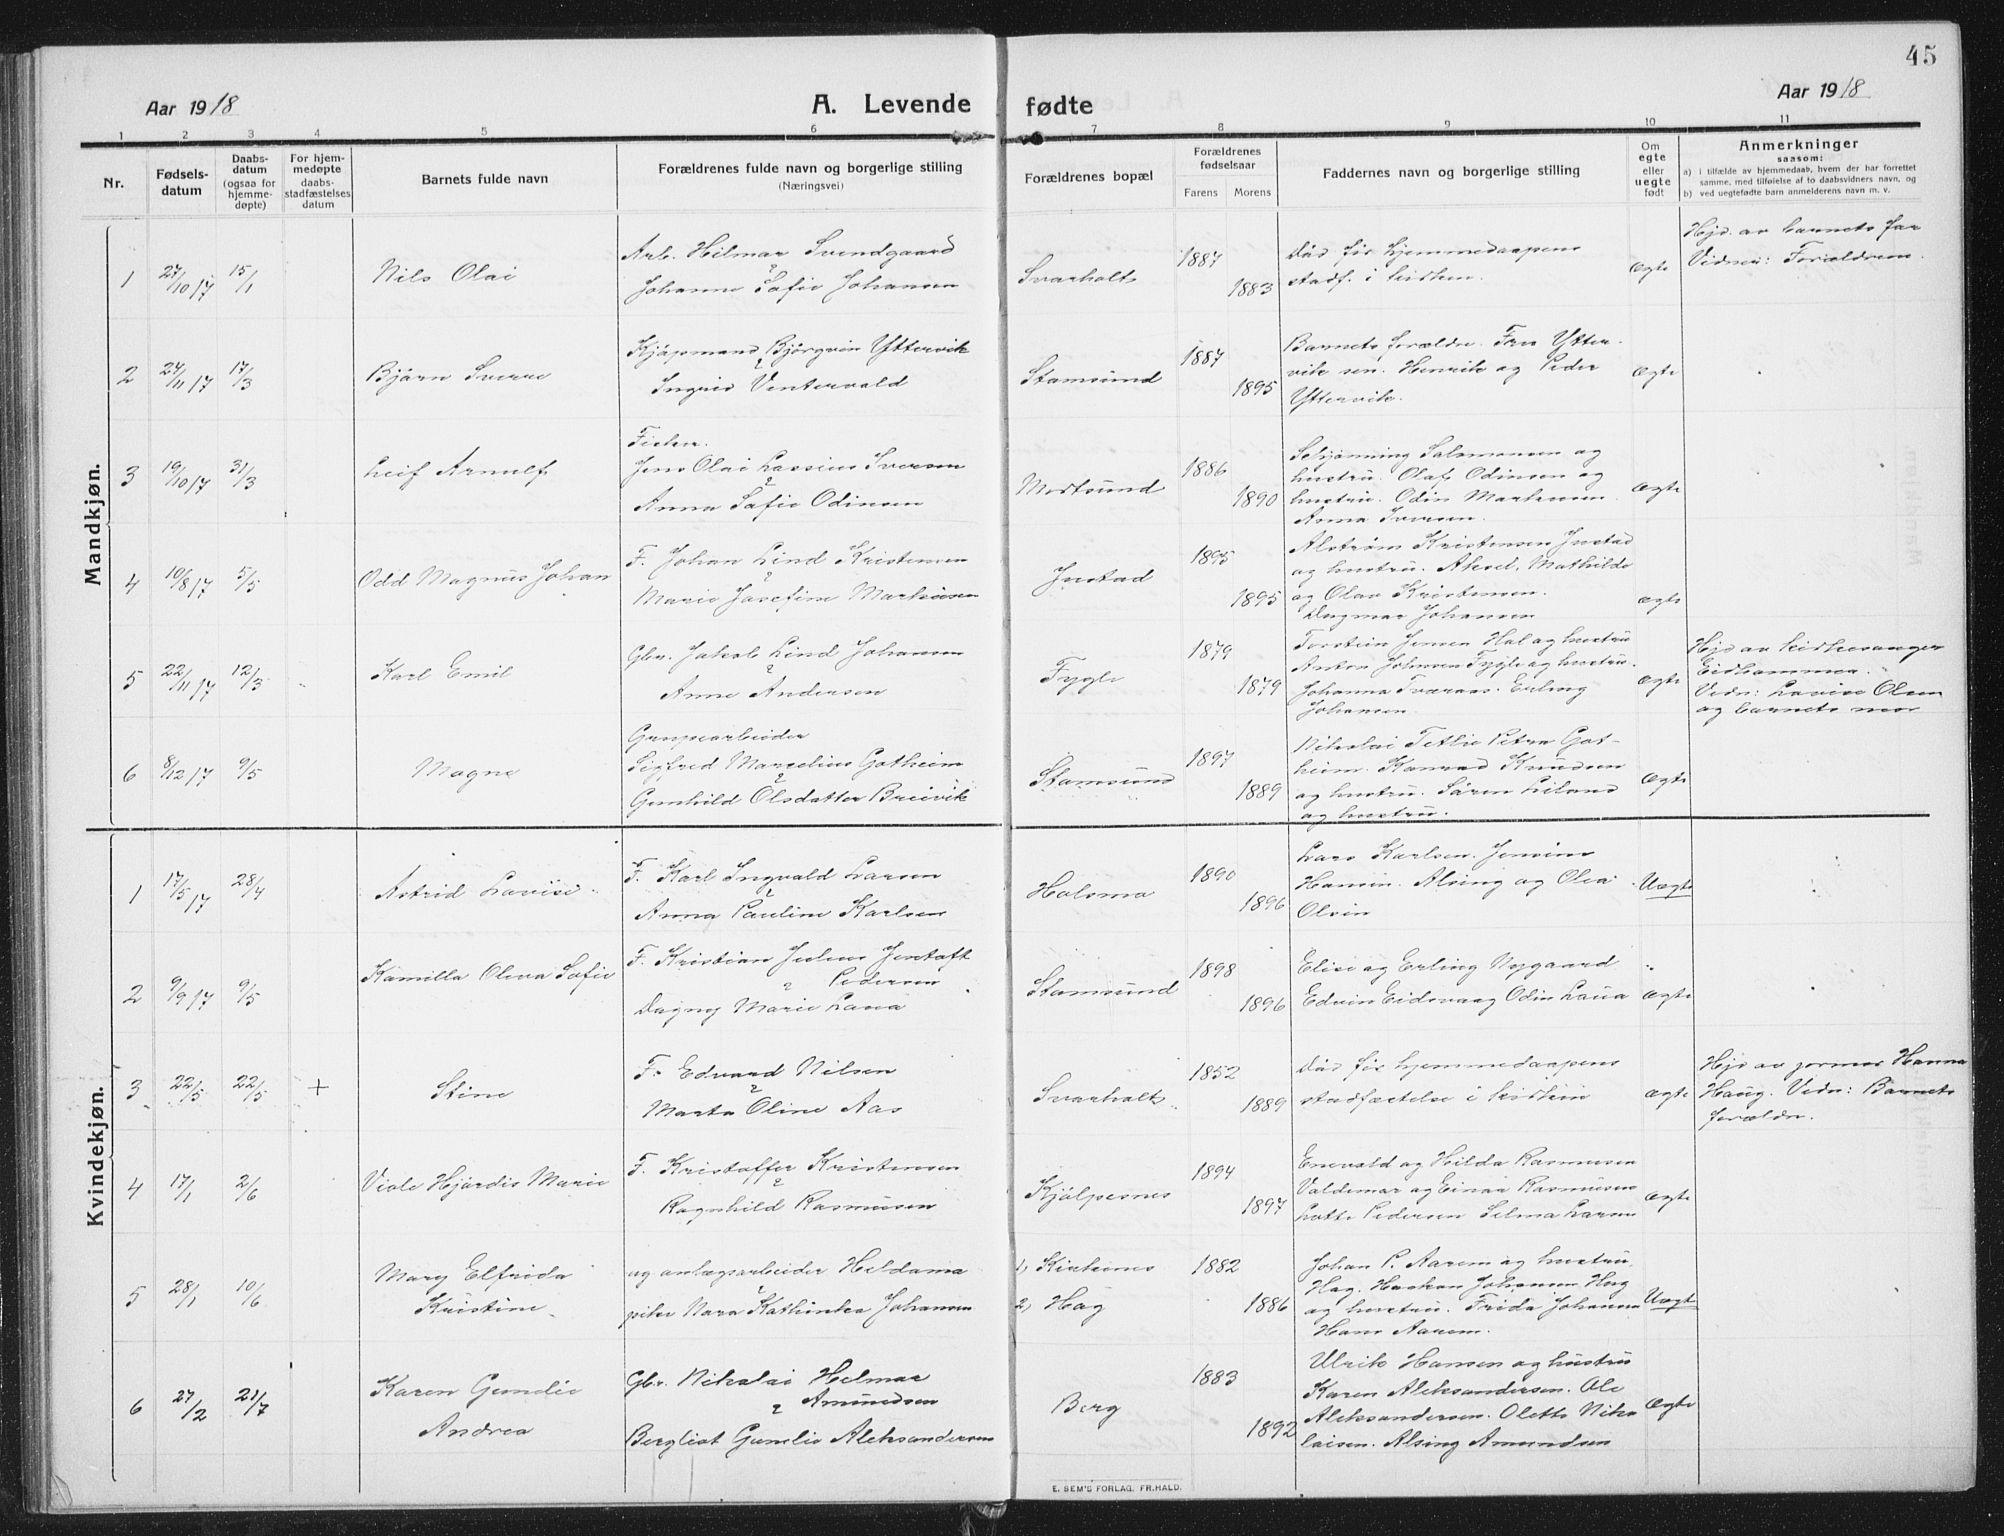 SAT, Ministerialprotokoller, klokkerbøker og fødselsregistre - Nordland, 882/L1183: Klokkerbok nr. 882C01, 1911-1938, s. 45